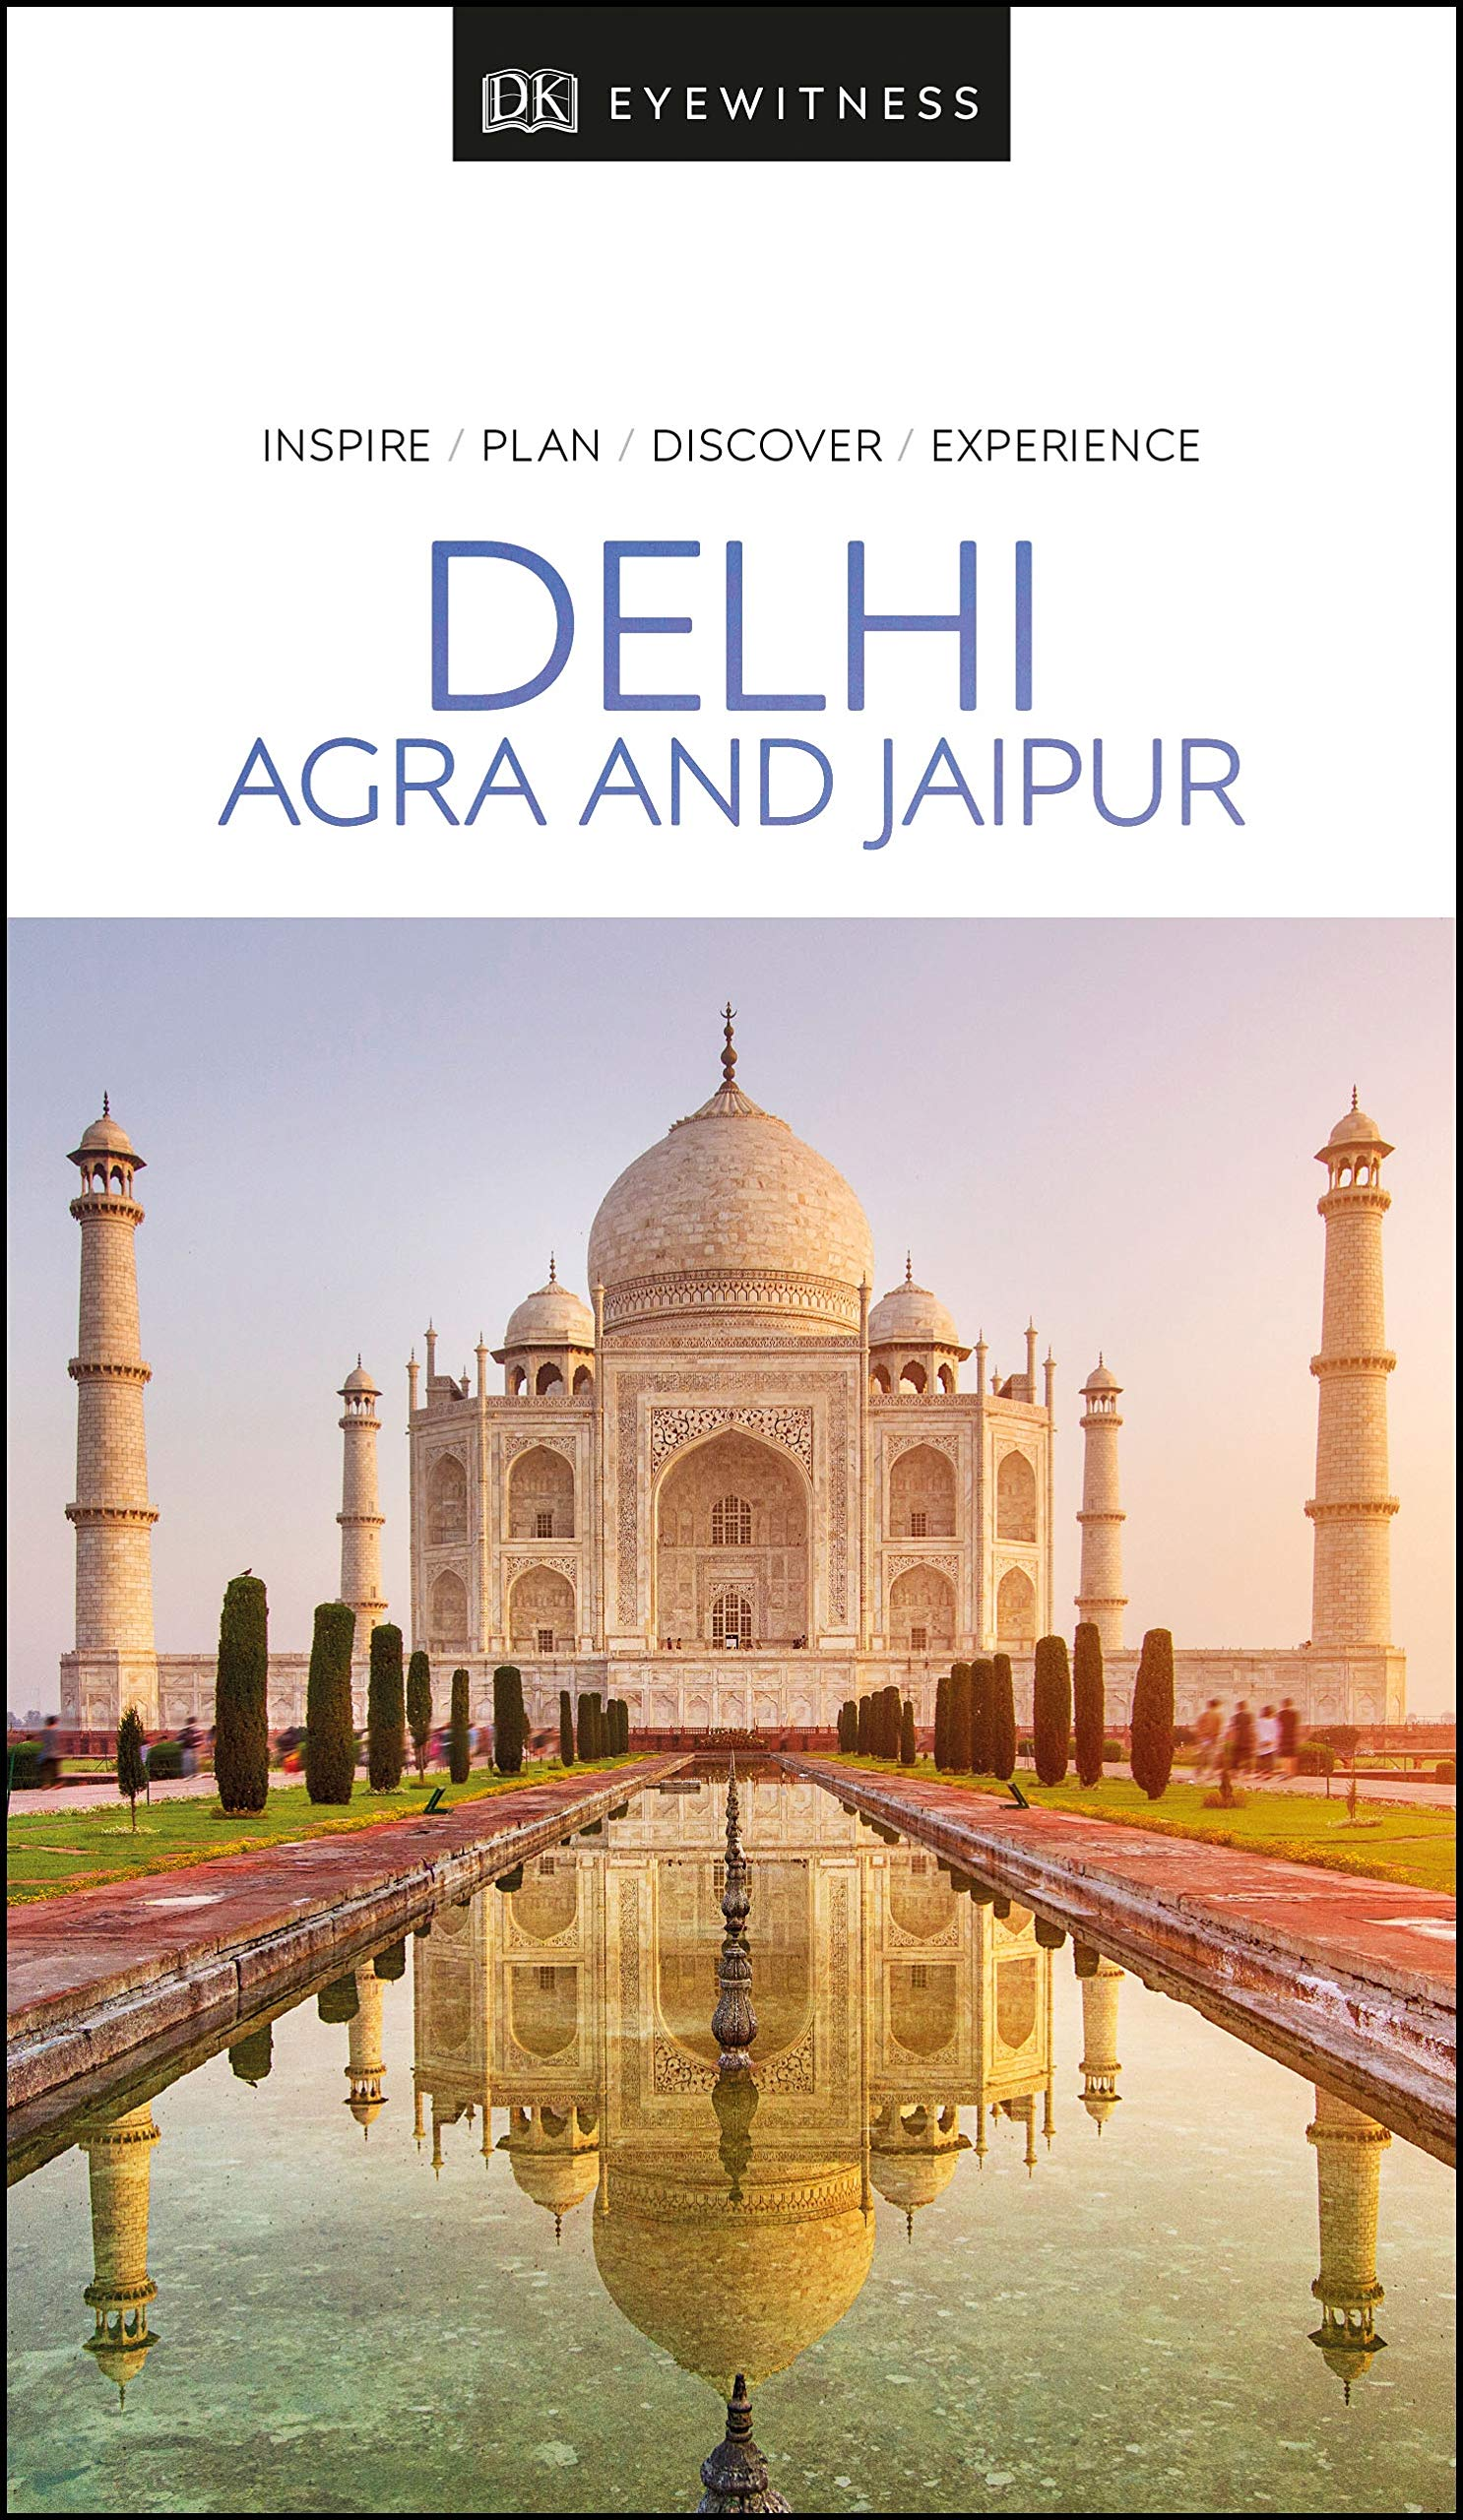 Delhi, Agra and Jaipur